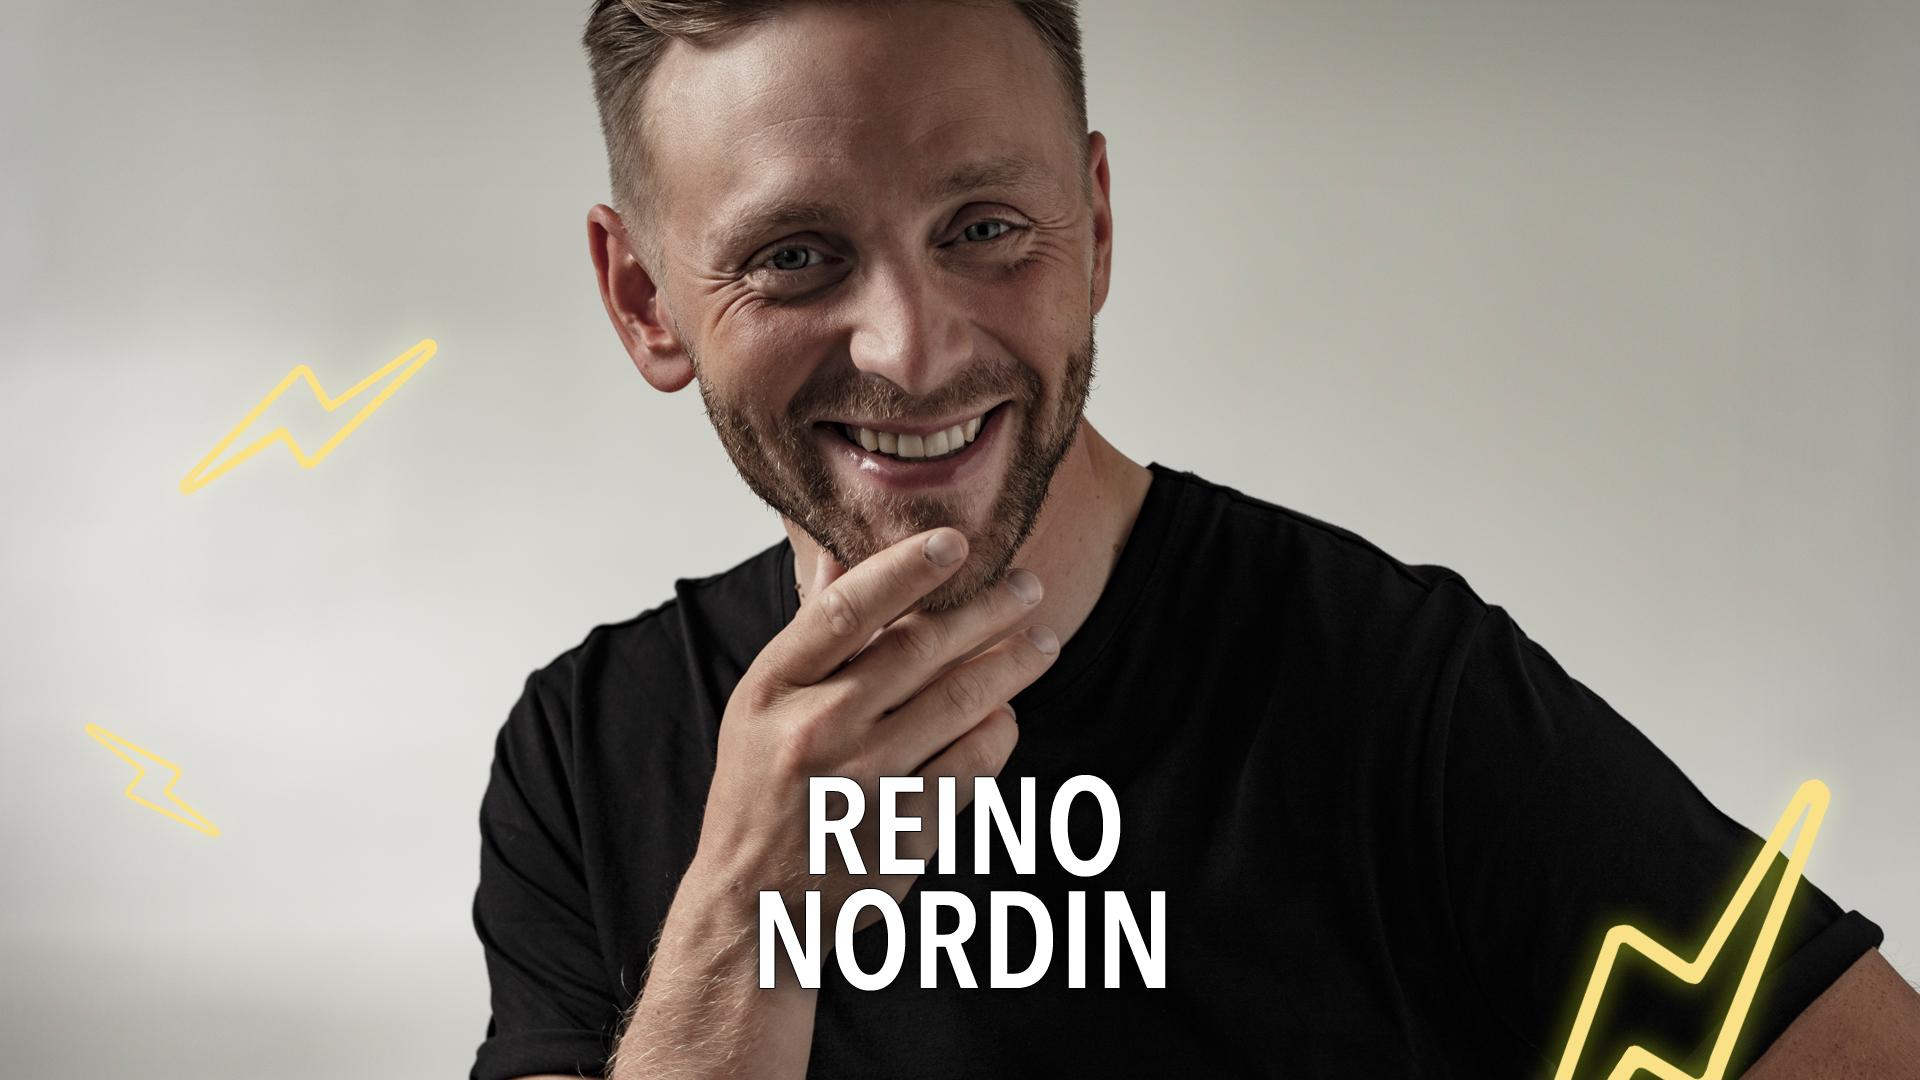 REINO-NORDIN_1920x1080